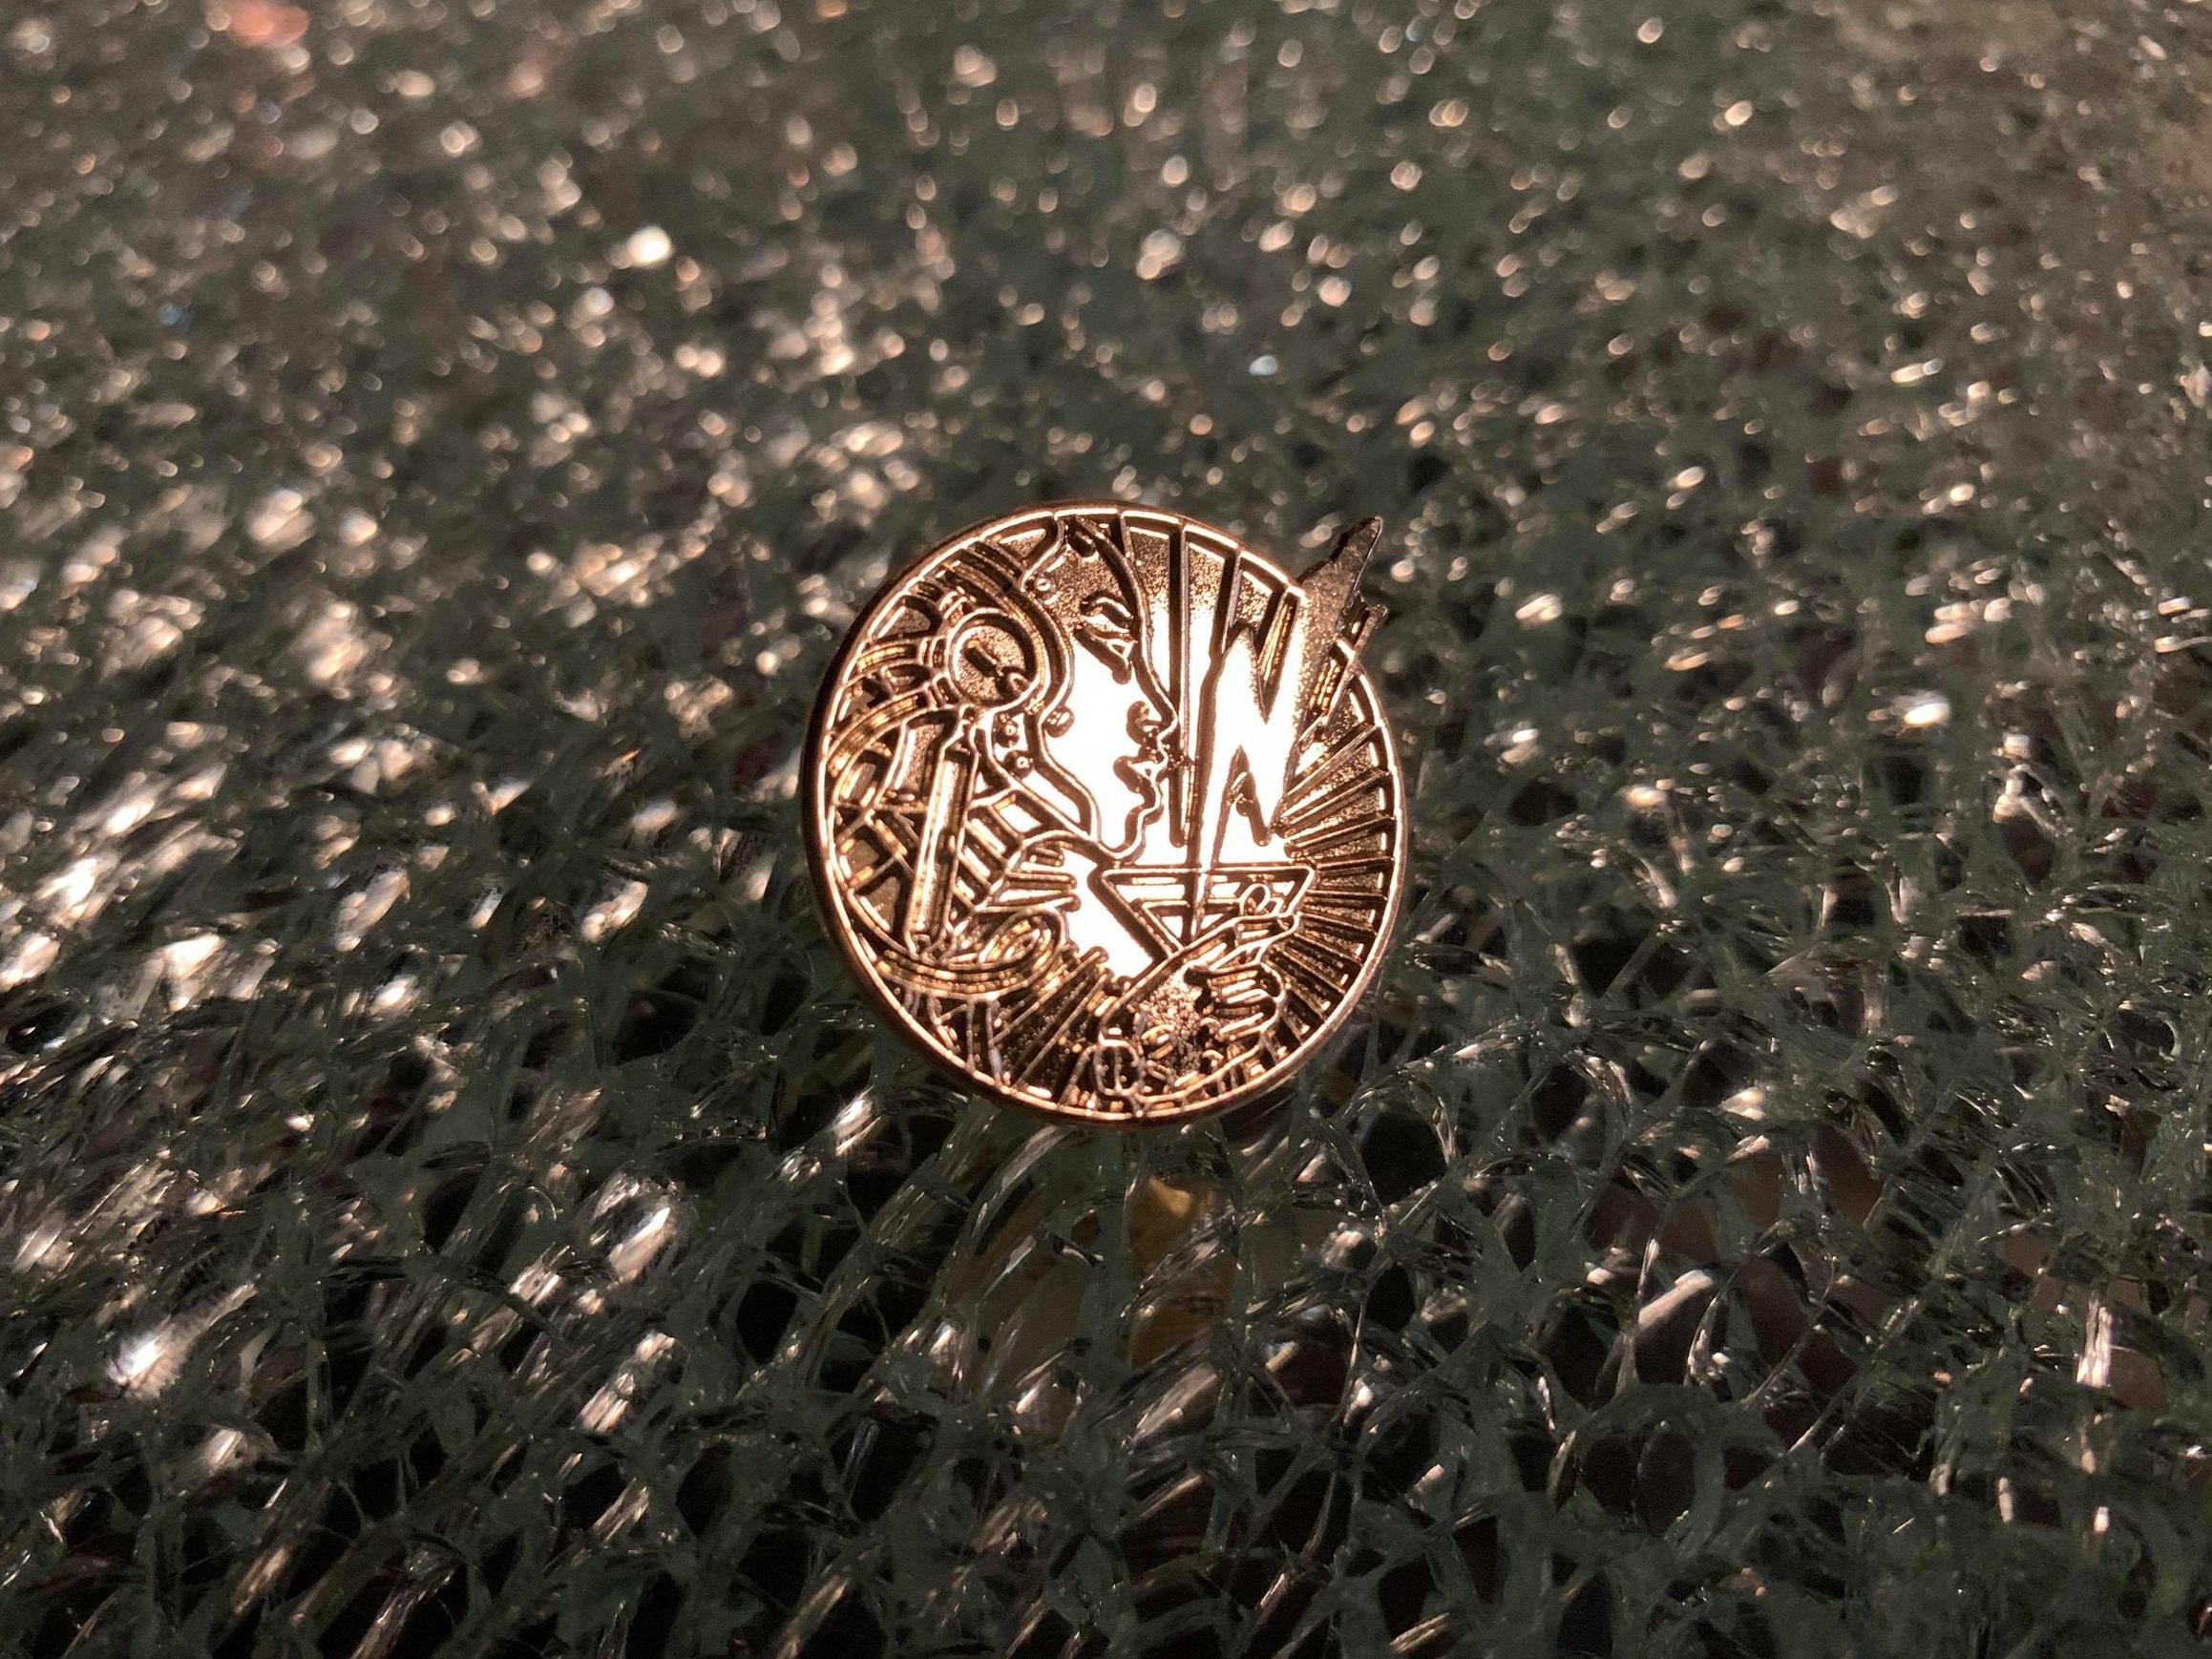 Brass lapel pin - $8